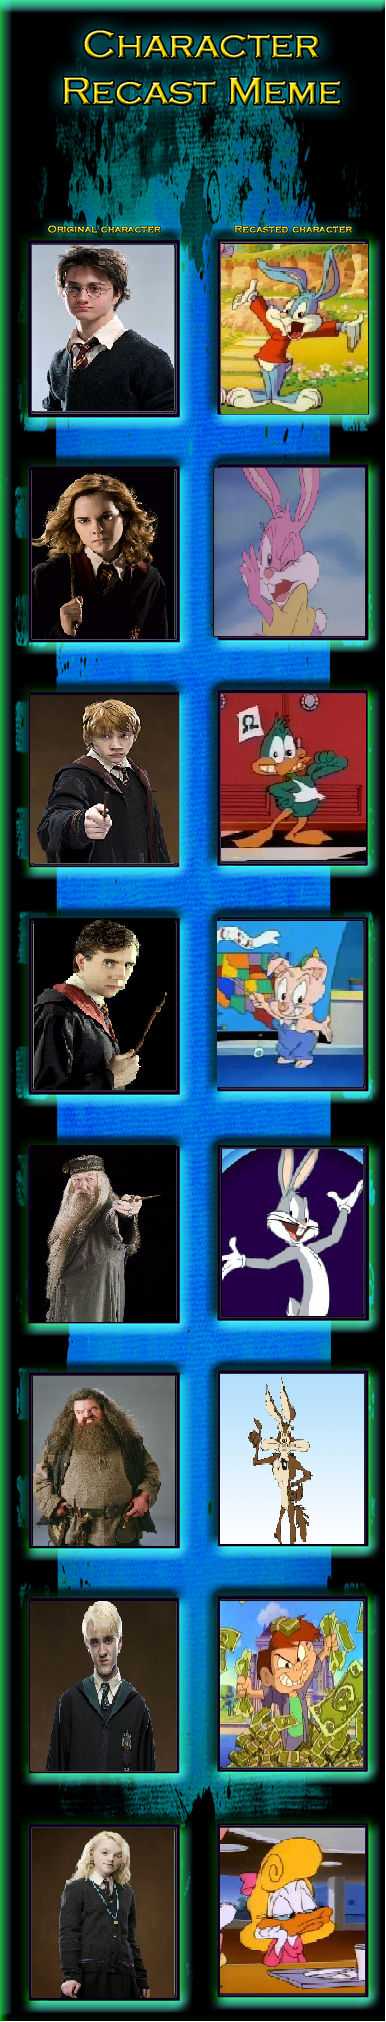 Character Recast Meme (HP and TTA/LT)